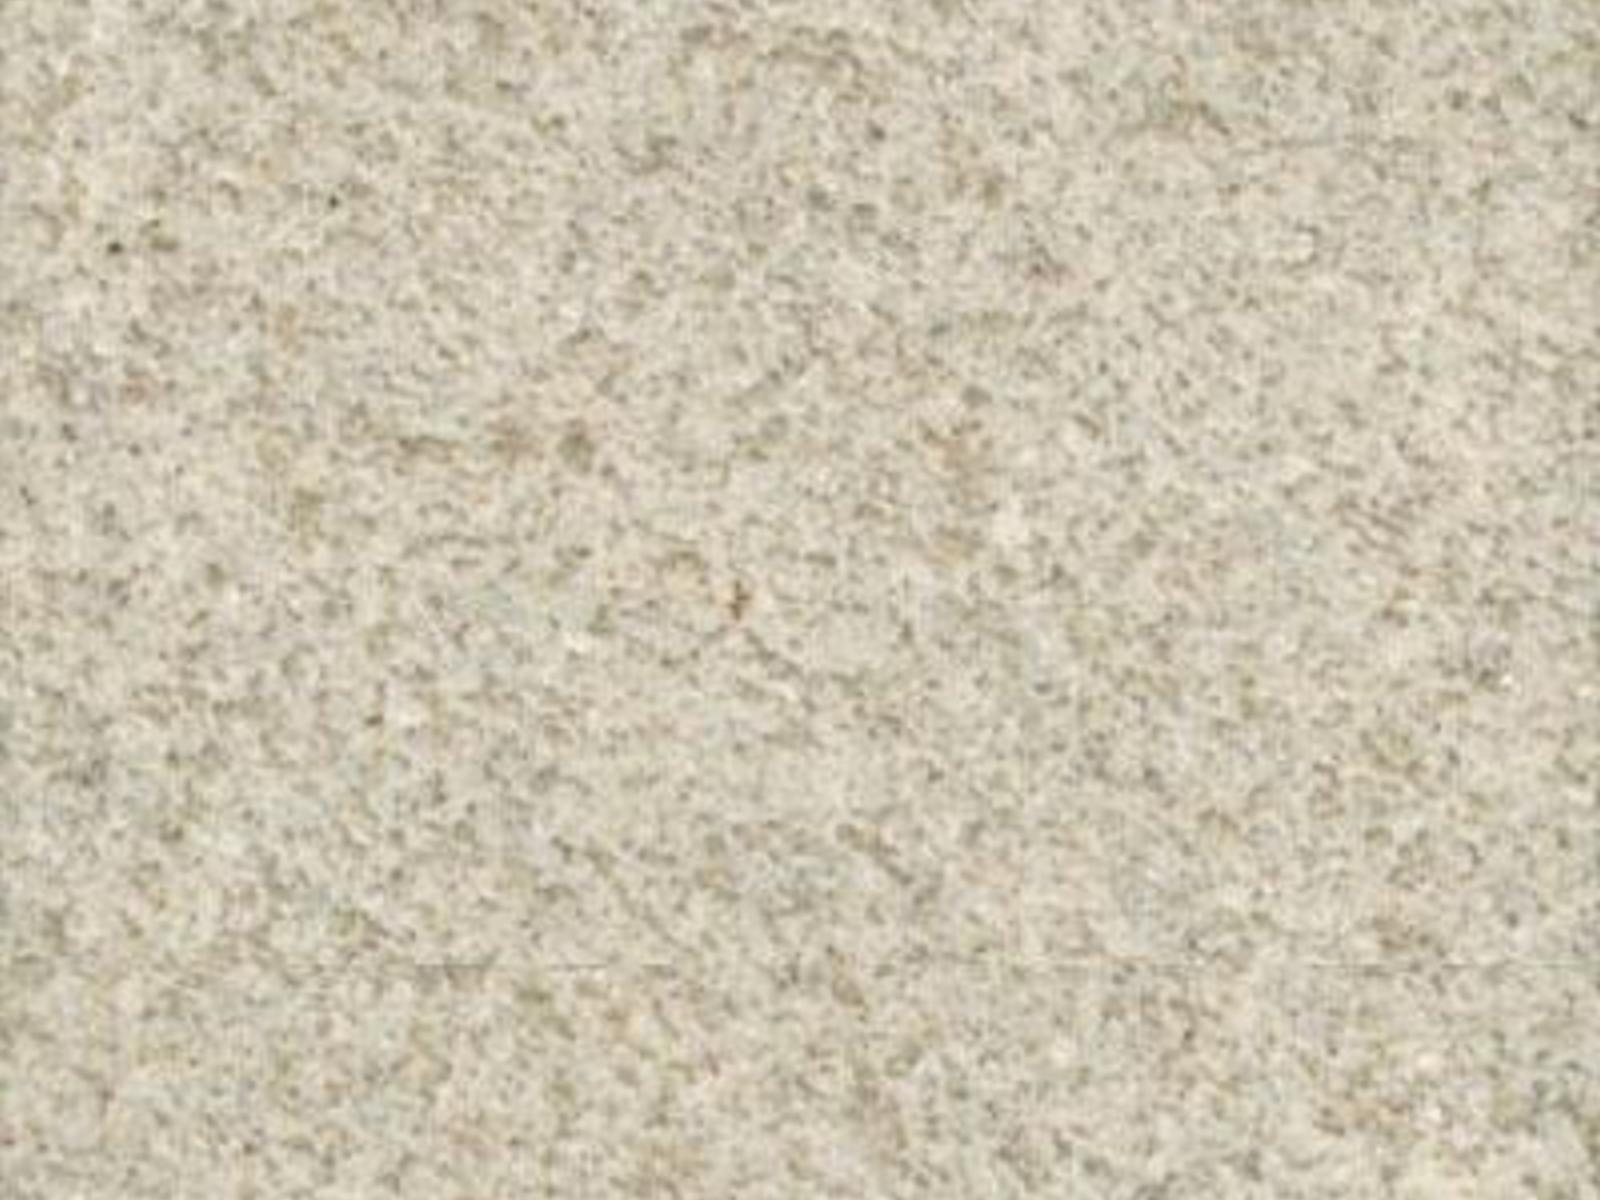 Granito Branco Itaunas Texturas M 225 Rmores E Granitos